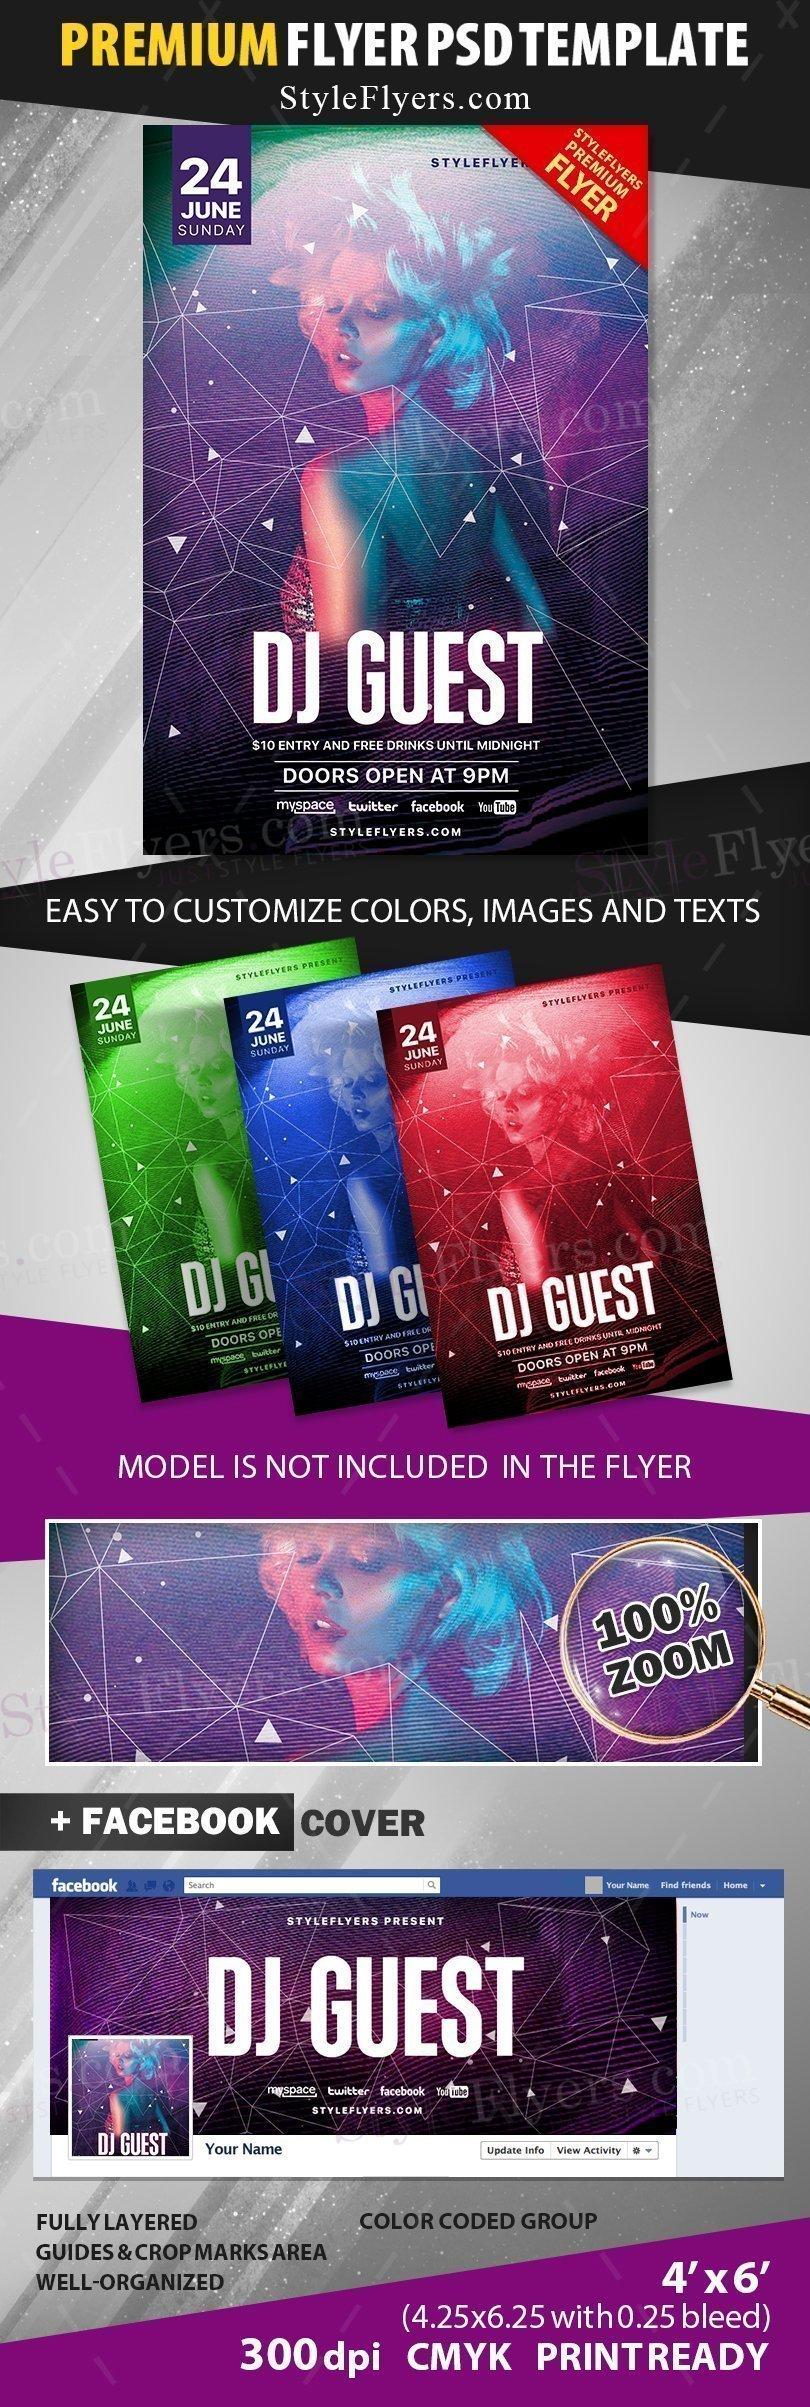 preview_guest dj_psd_flyer